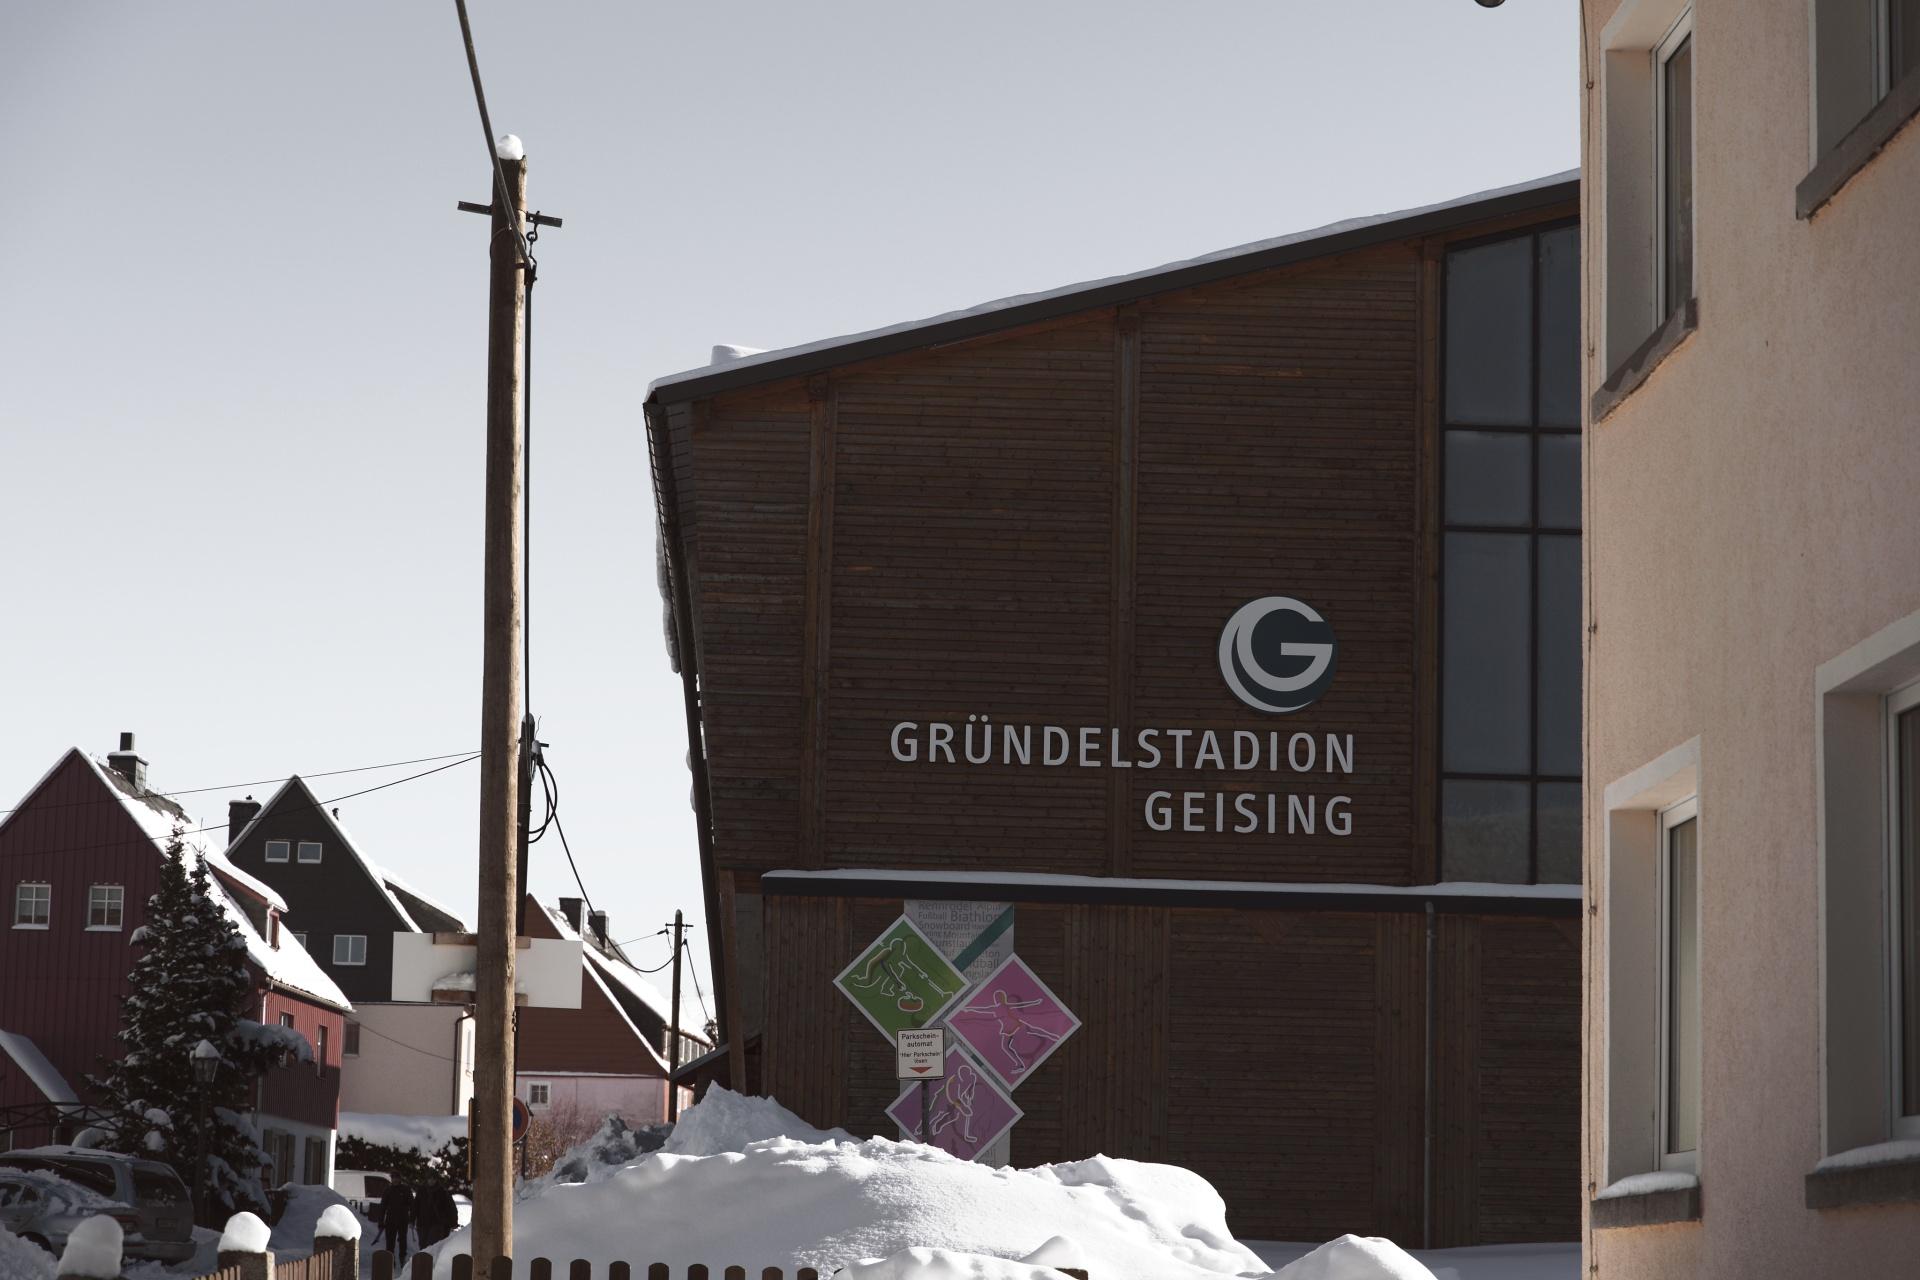 Gründelstadion Geising